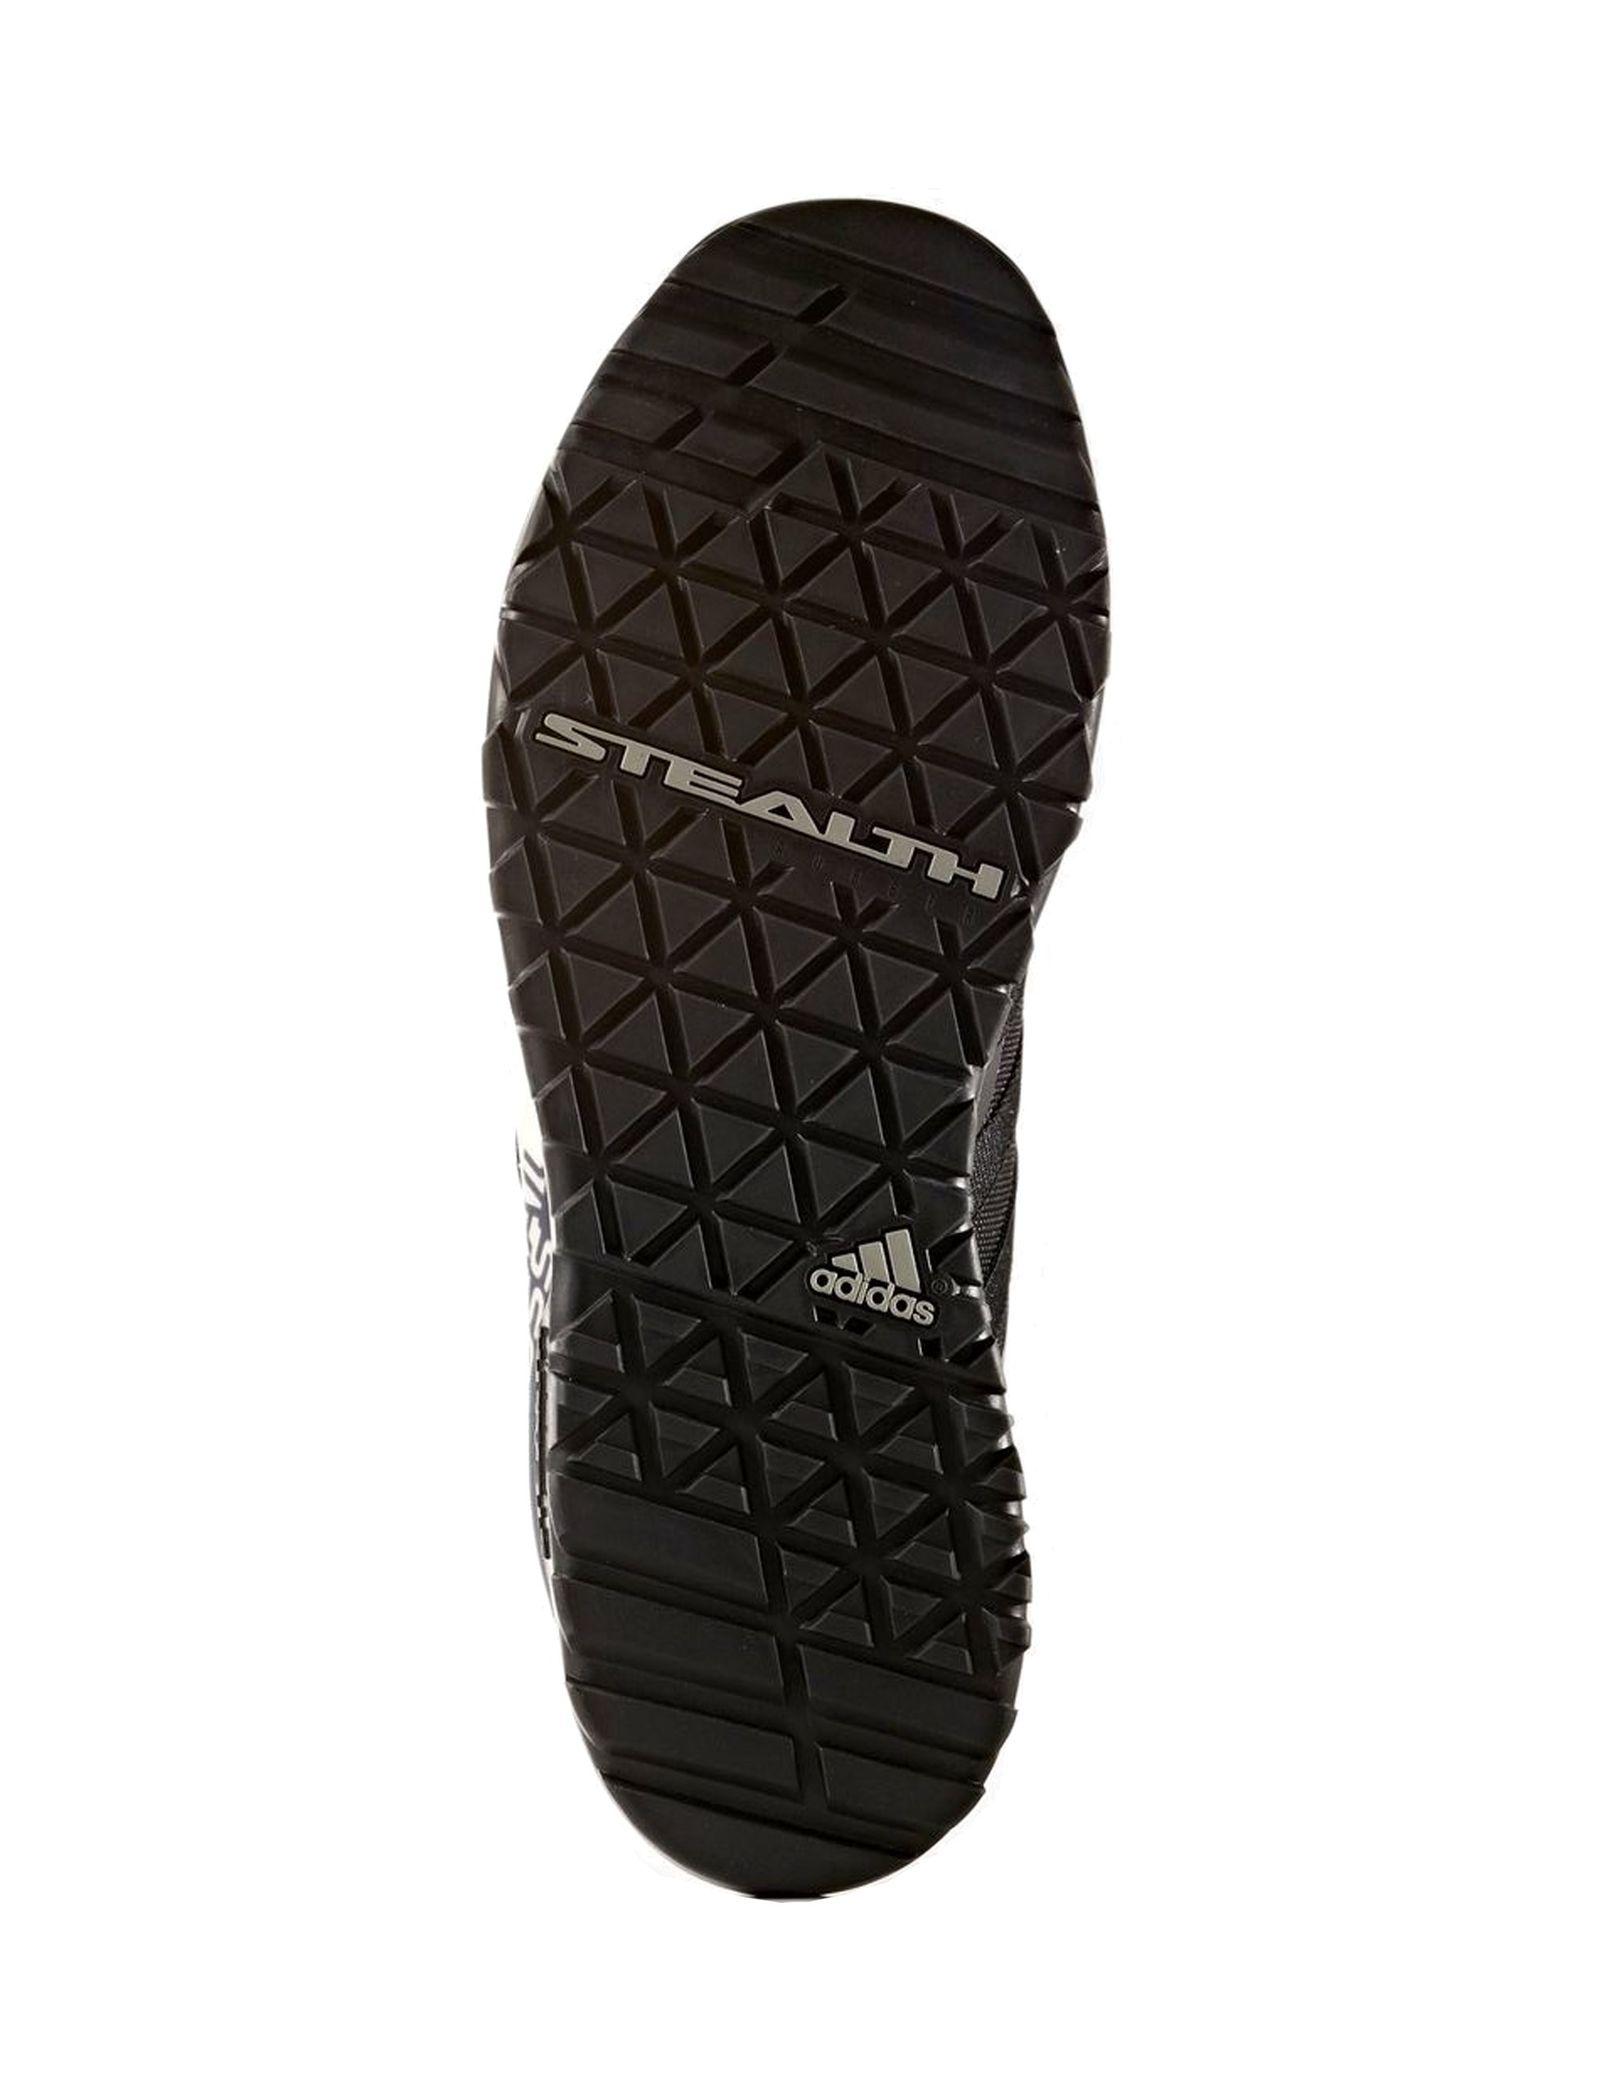 کفش طبیعت گردی بندی مردانه Terrex Trail Cross SL - آدیداس - مشکي - 3